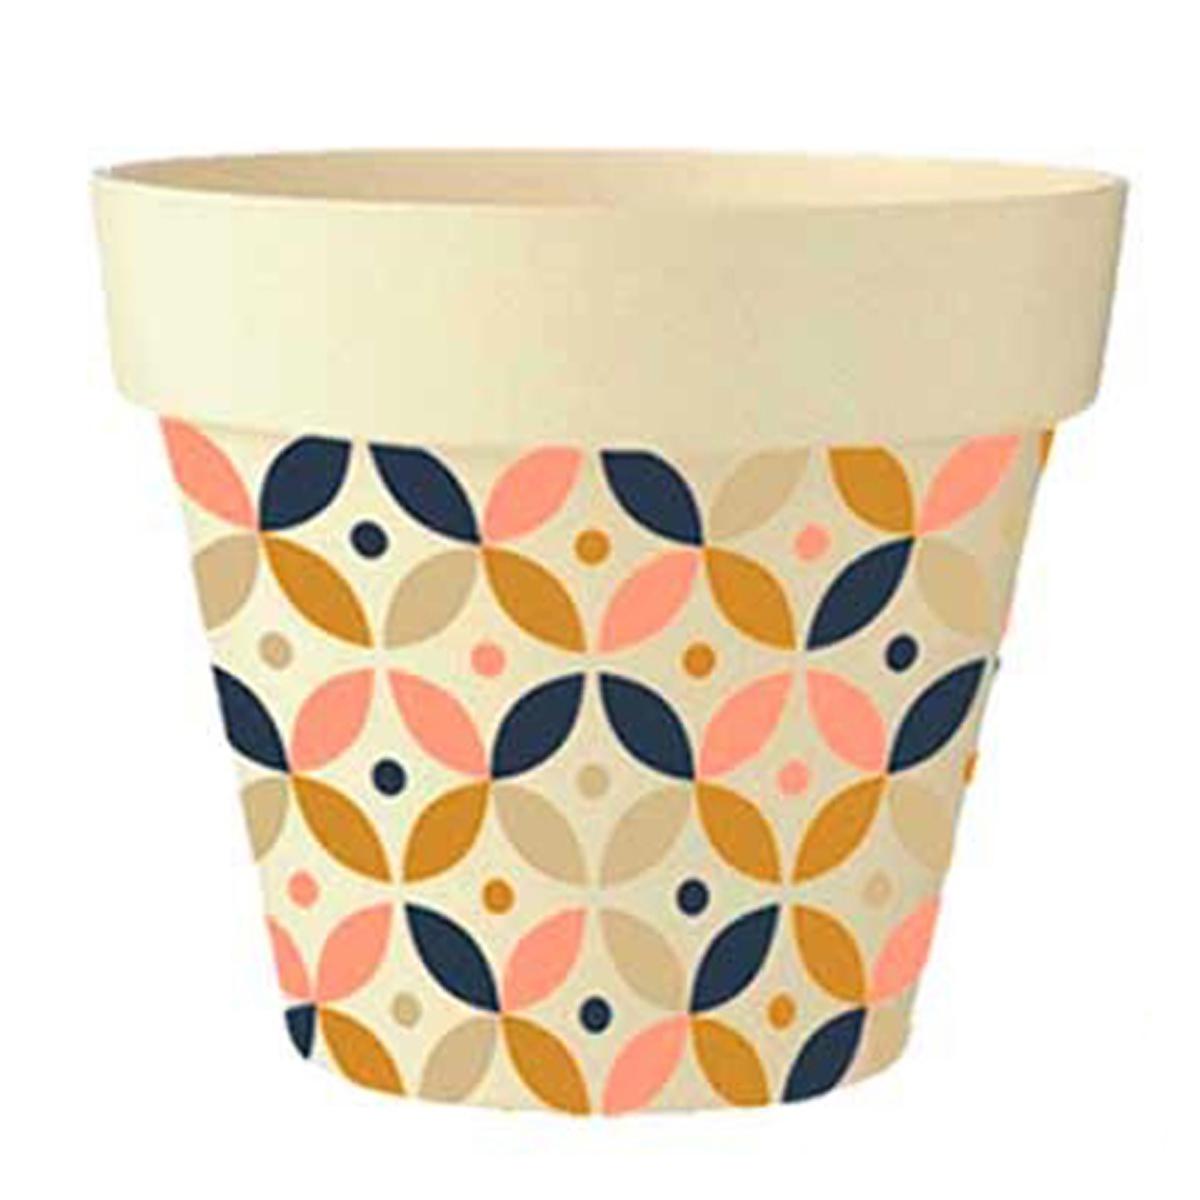 Cache-pot bambou \'Boho\' rose marron marine beige -  135x15 cm - [Q6414]